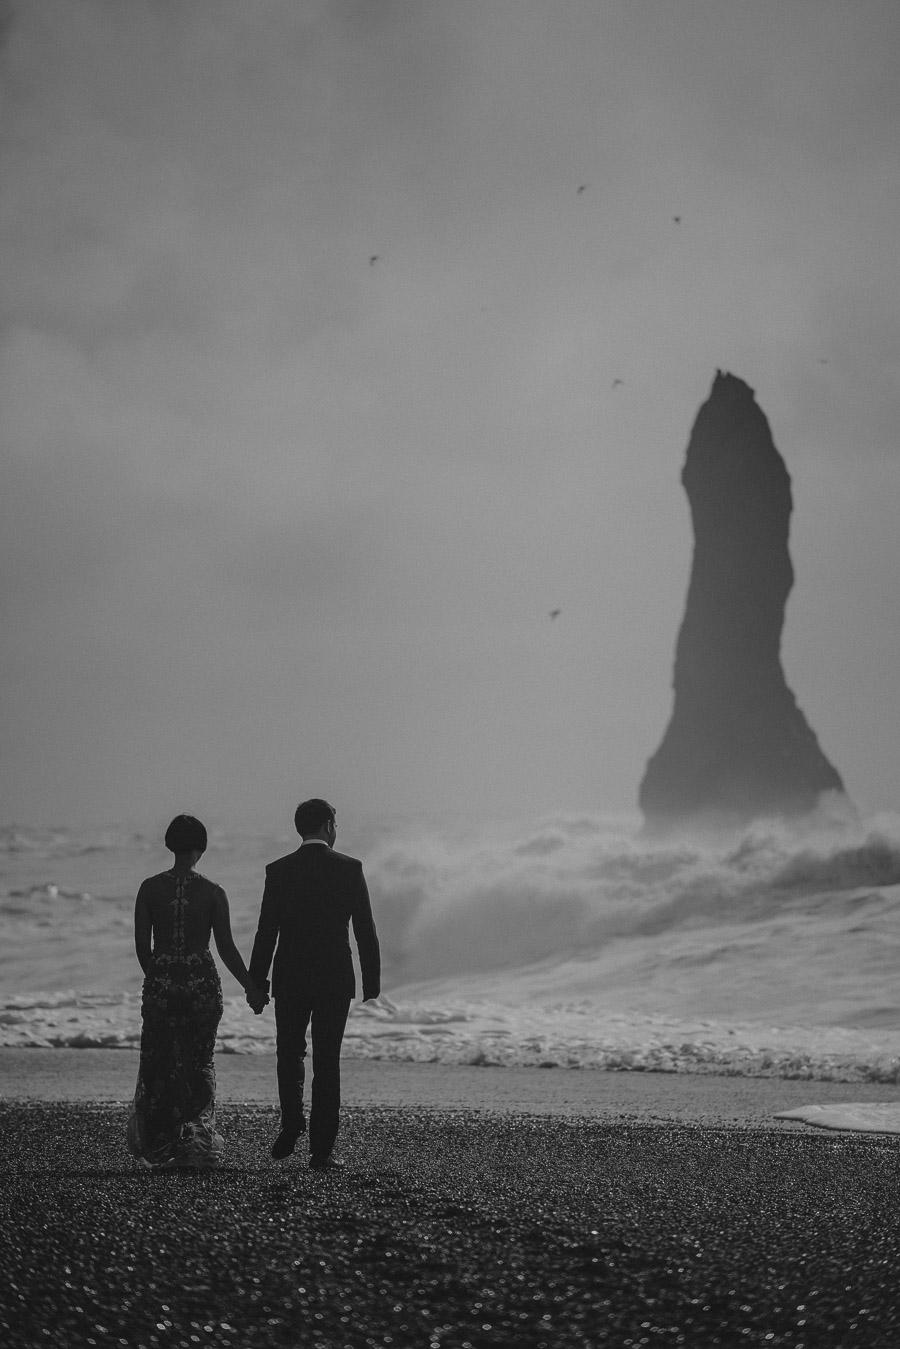 Best_wedding_photos_moments_2014_mait_juriado_M&J-Studios-110